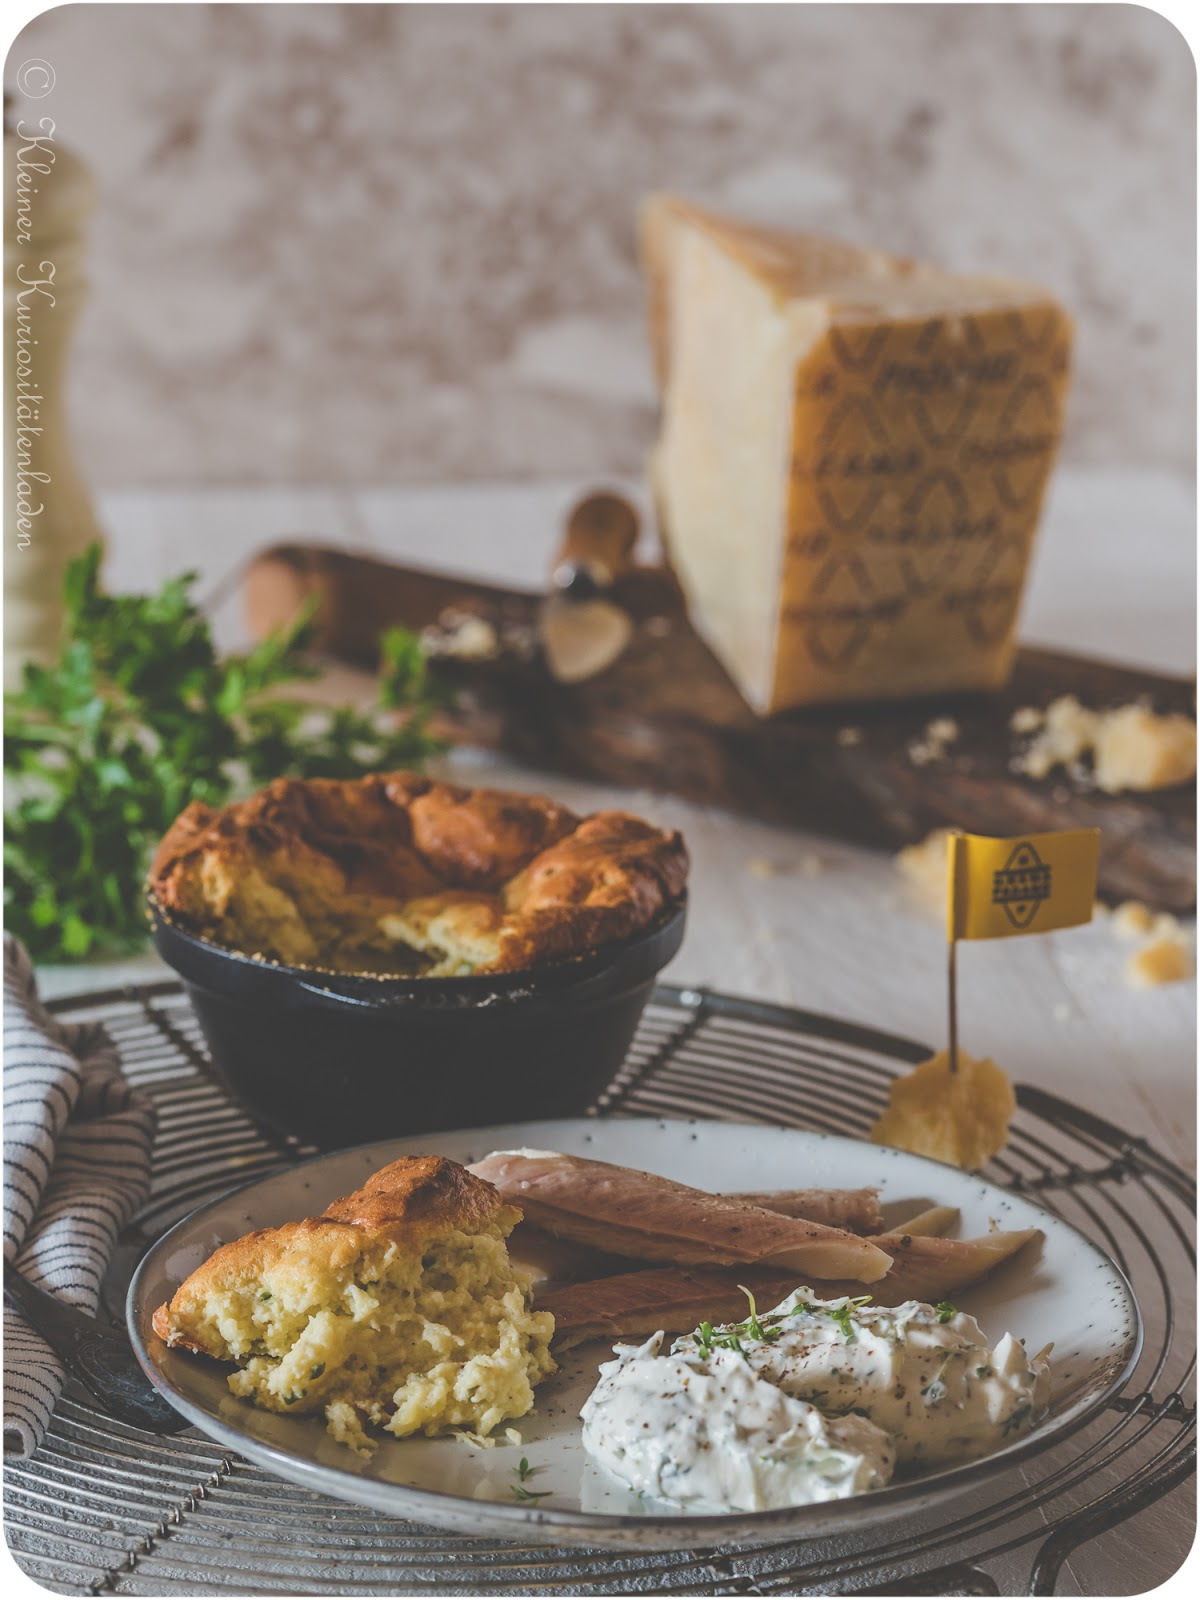 Kartoffel-Käse-Soufflé mit Grana Padano und Kräutern